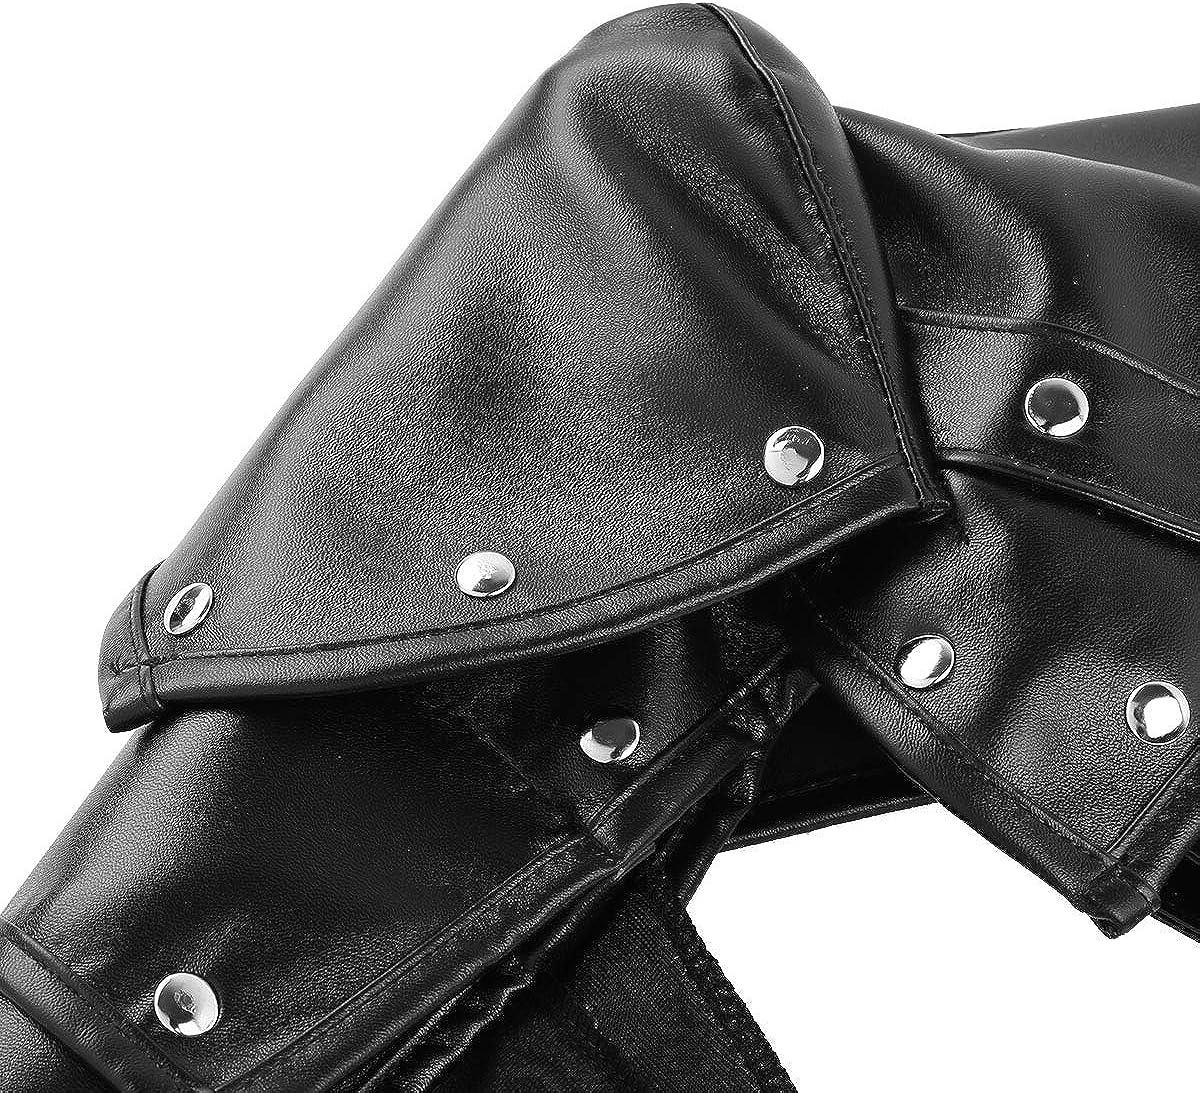 TiaoBug Armatura Regolabile in Pelle per Cosplay Steampunk Accessori per Donna e Uomini Halloween Festa Carnevale Party Imbracatura Clubwear Stile Punk Gotico